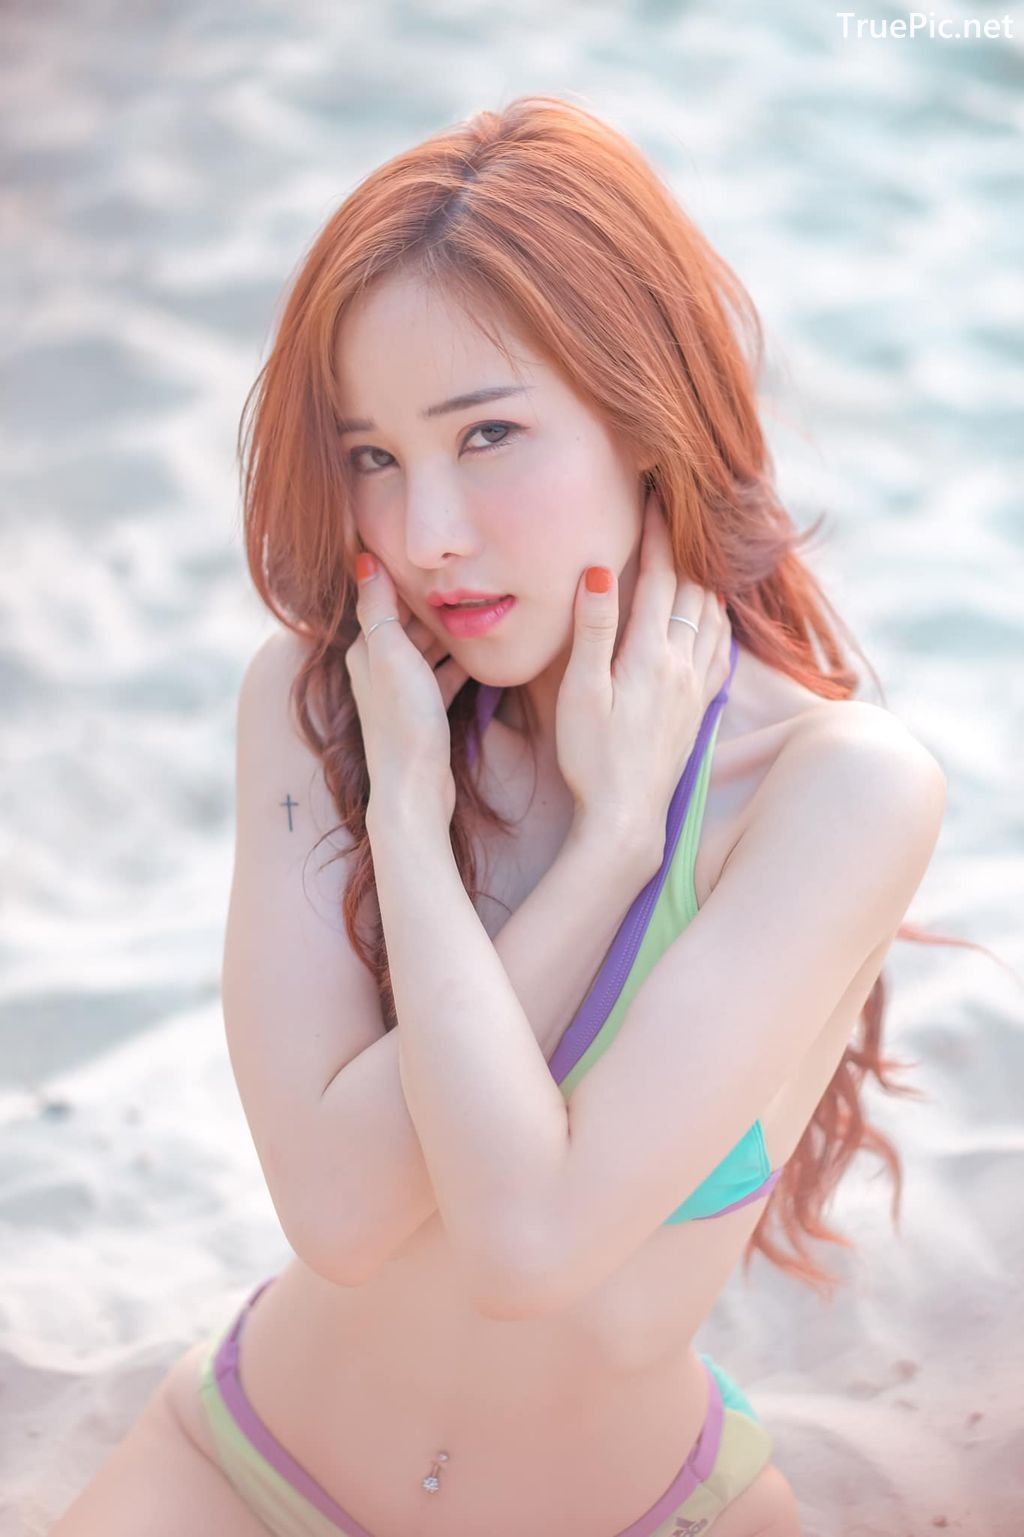 Image-Thailand-Model-Arys-Nam-in-Arysiacara-Summer-Time-Sweet-Bikini-TruePic.net- Picture-8